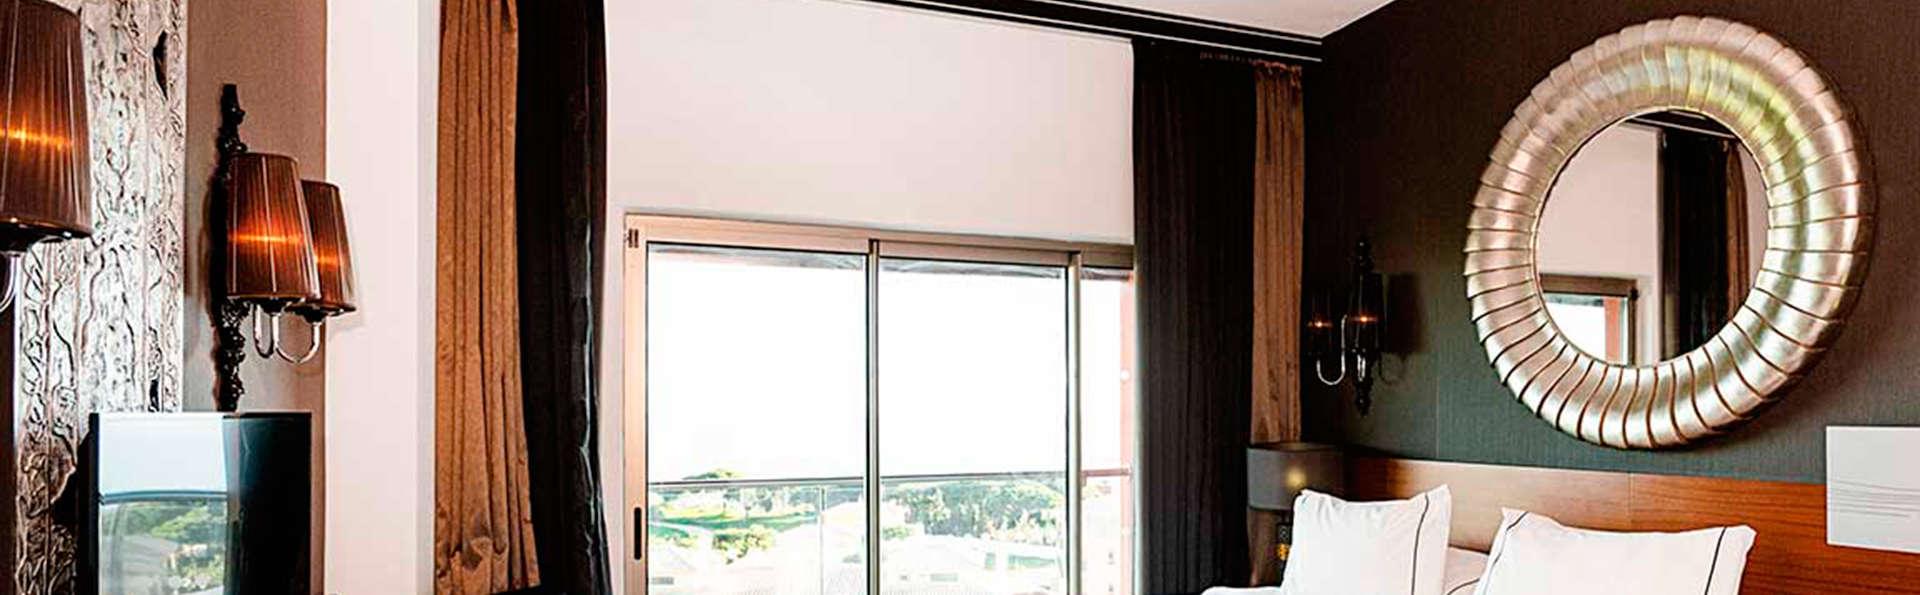 Aqua Pedra Dos Bicos Beach Hotel (Adults Only) - EDIT_room2.jpg